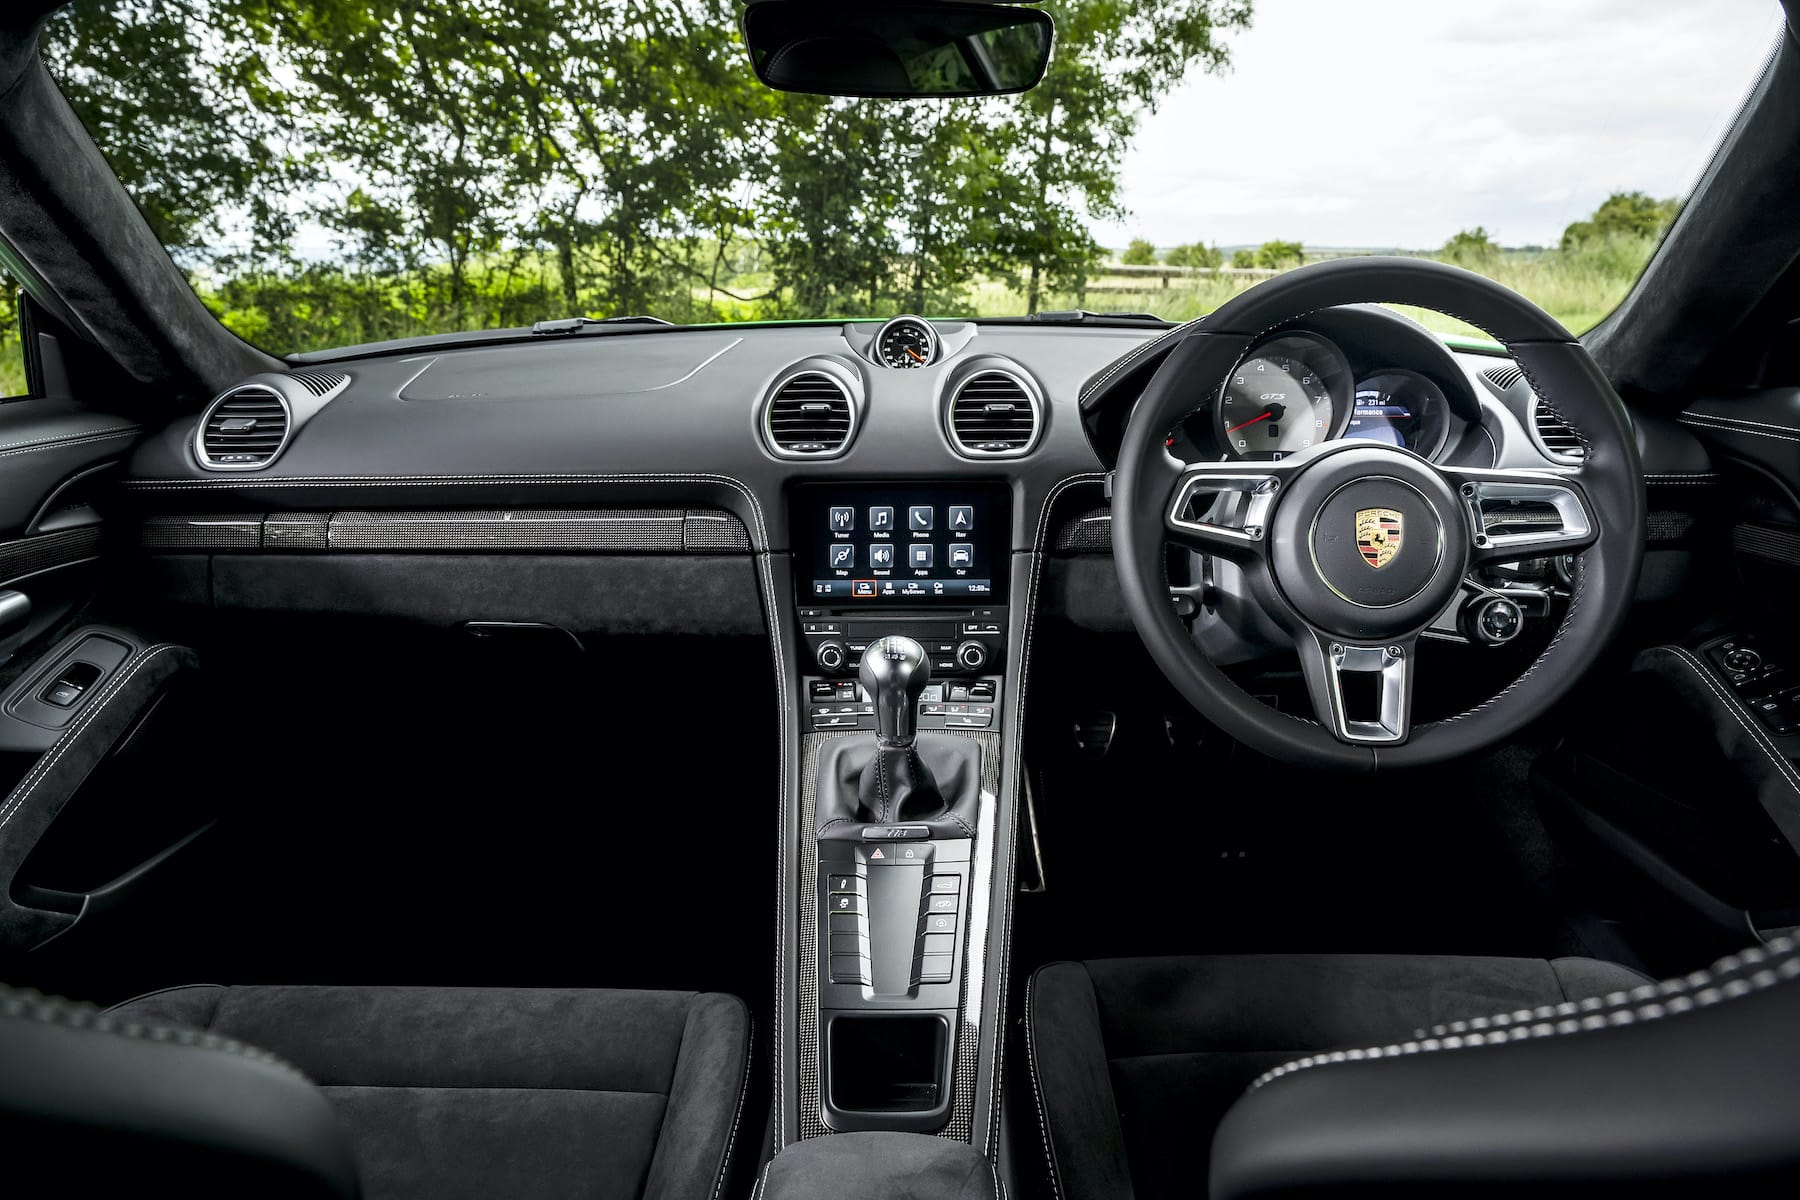 Porsche 718 Cayman GTS 4.0 (2016 onwards) - interior and dashboard